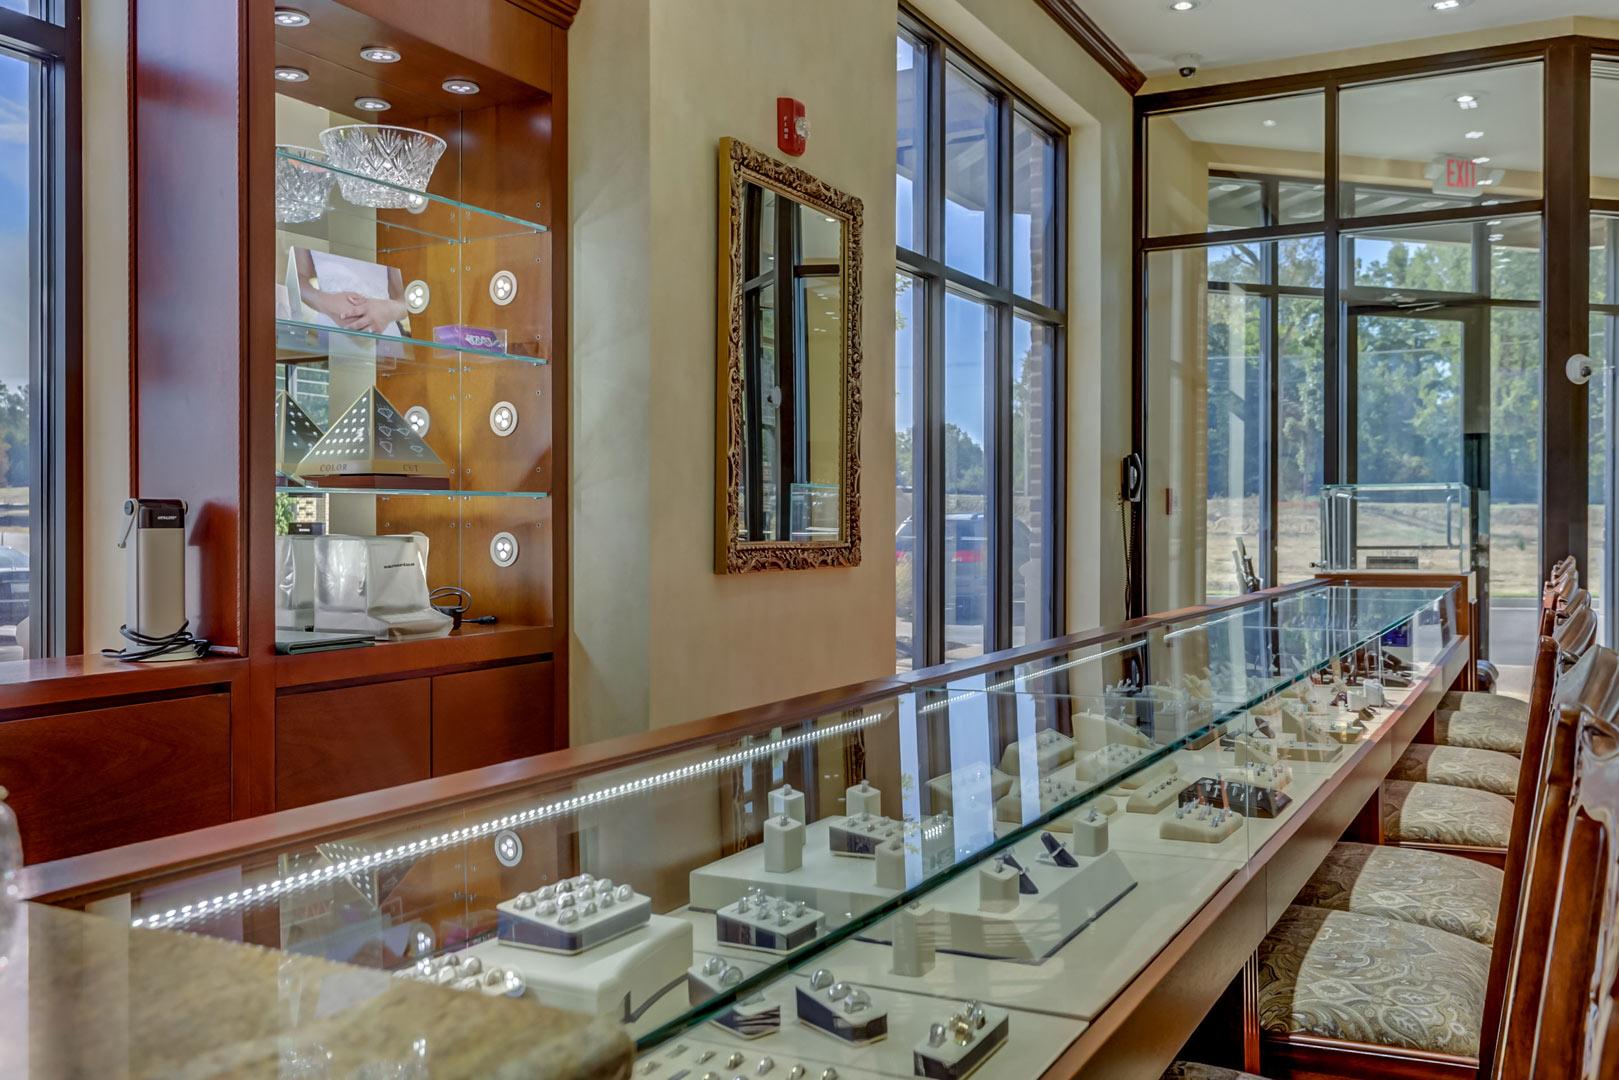 Albertine-Commercial-Bob-Richards-Jewelers-04.jpg